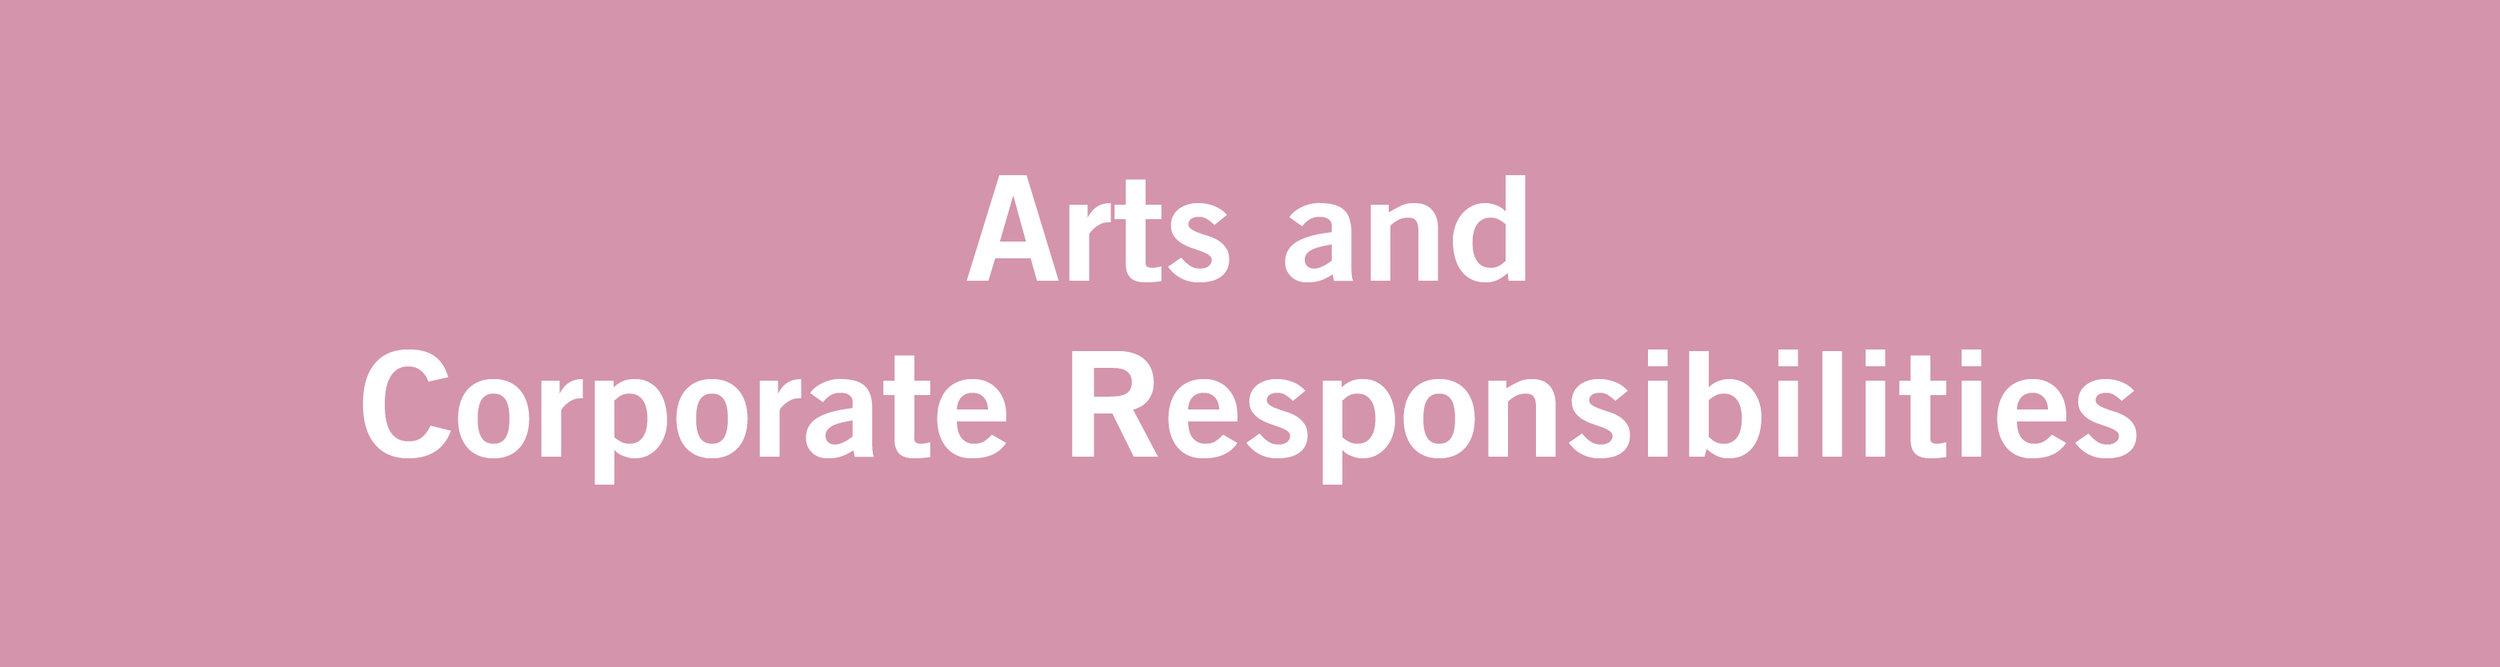 Arts Corportate-01.jpg